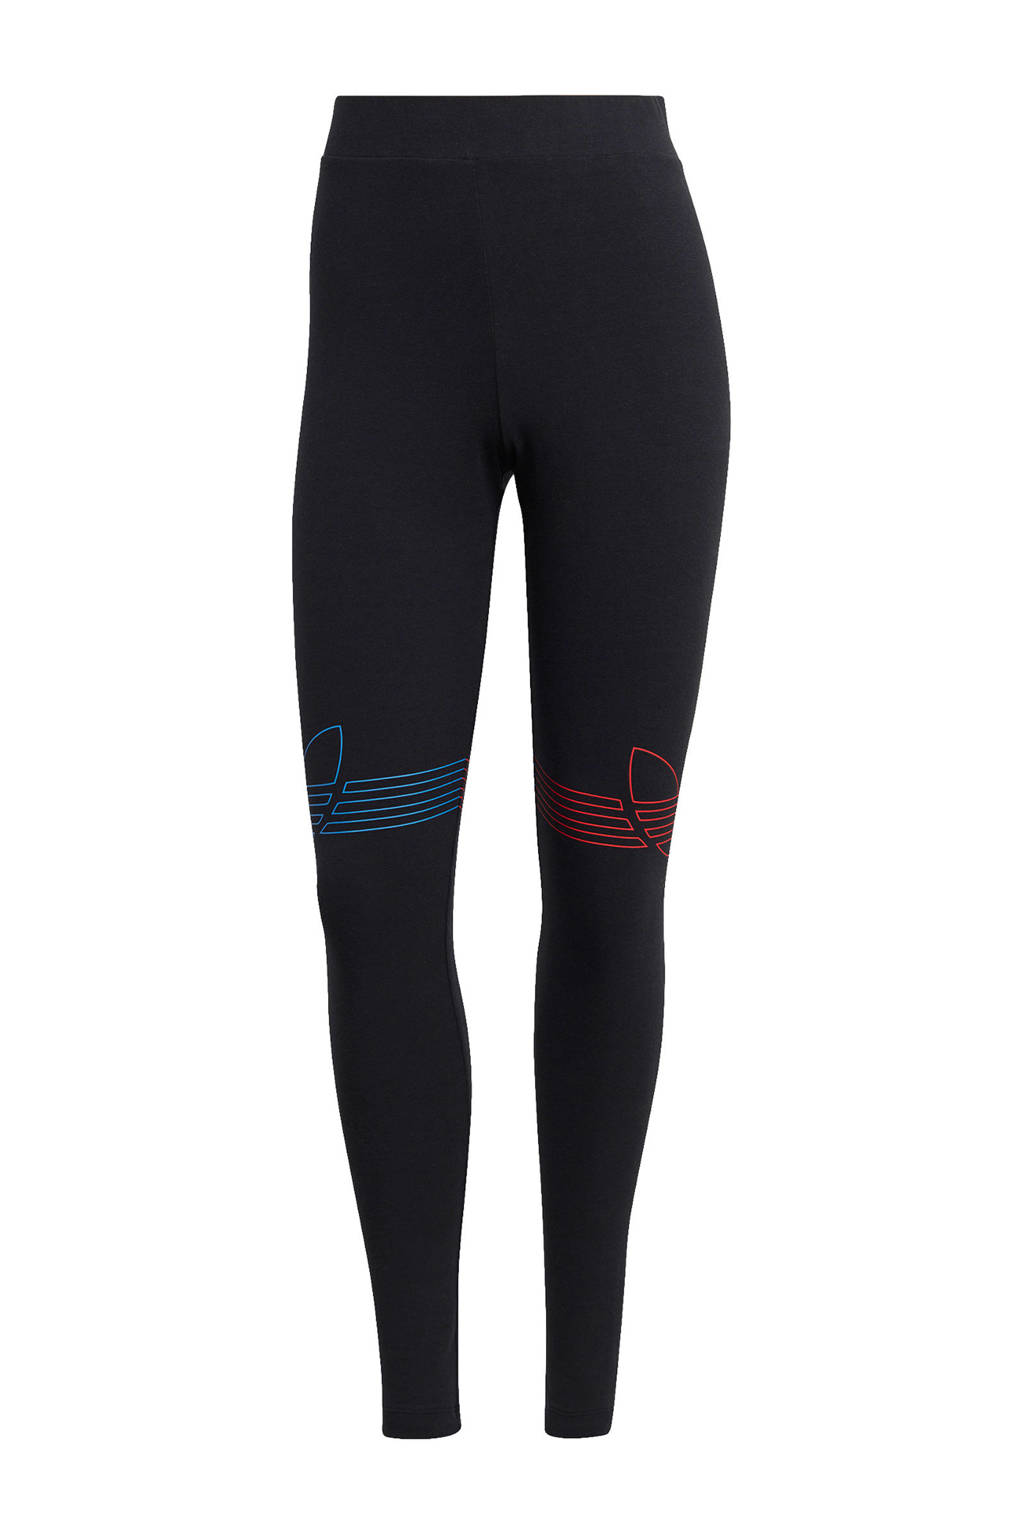 adidas Originals Adicolor legging zwart, Zwart